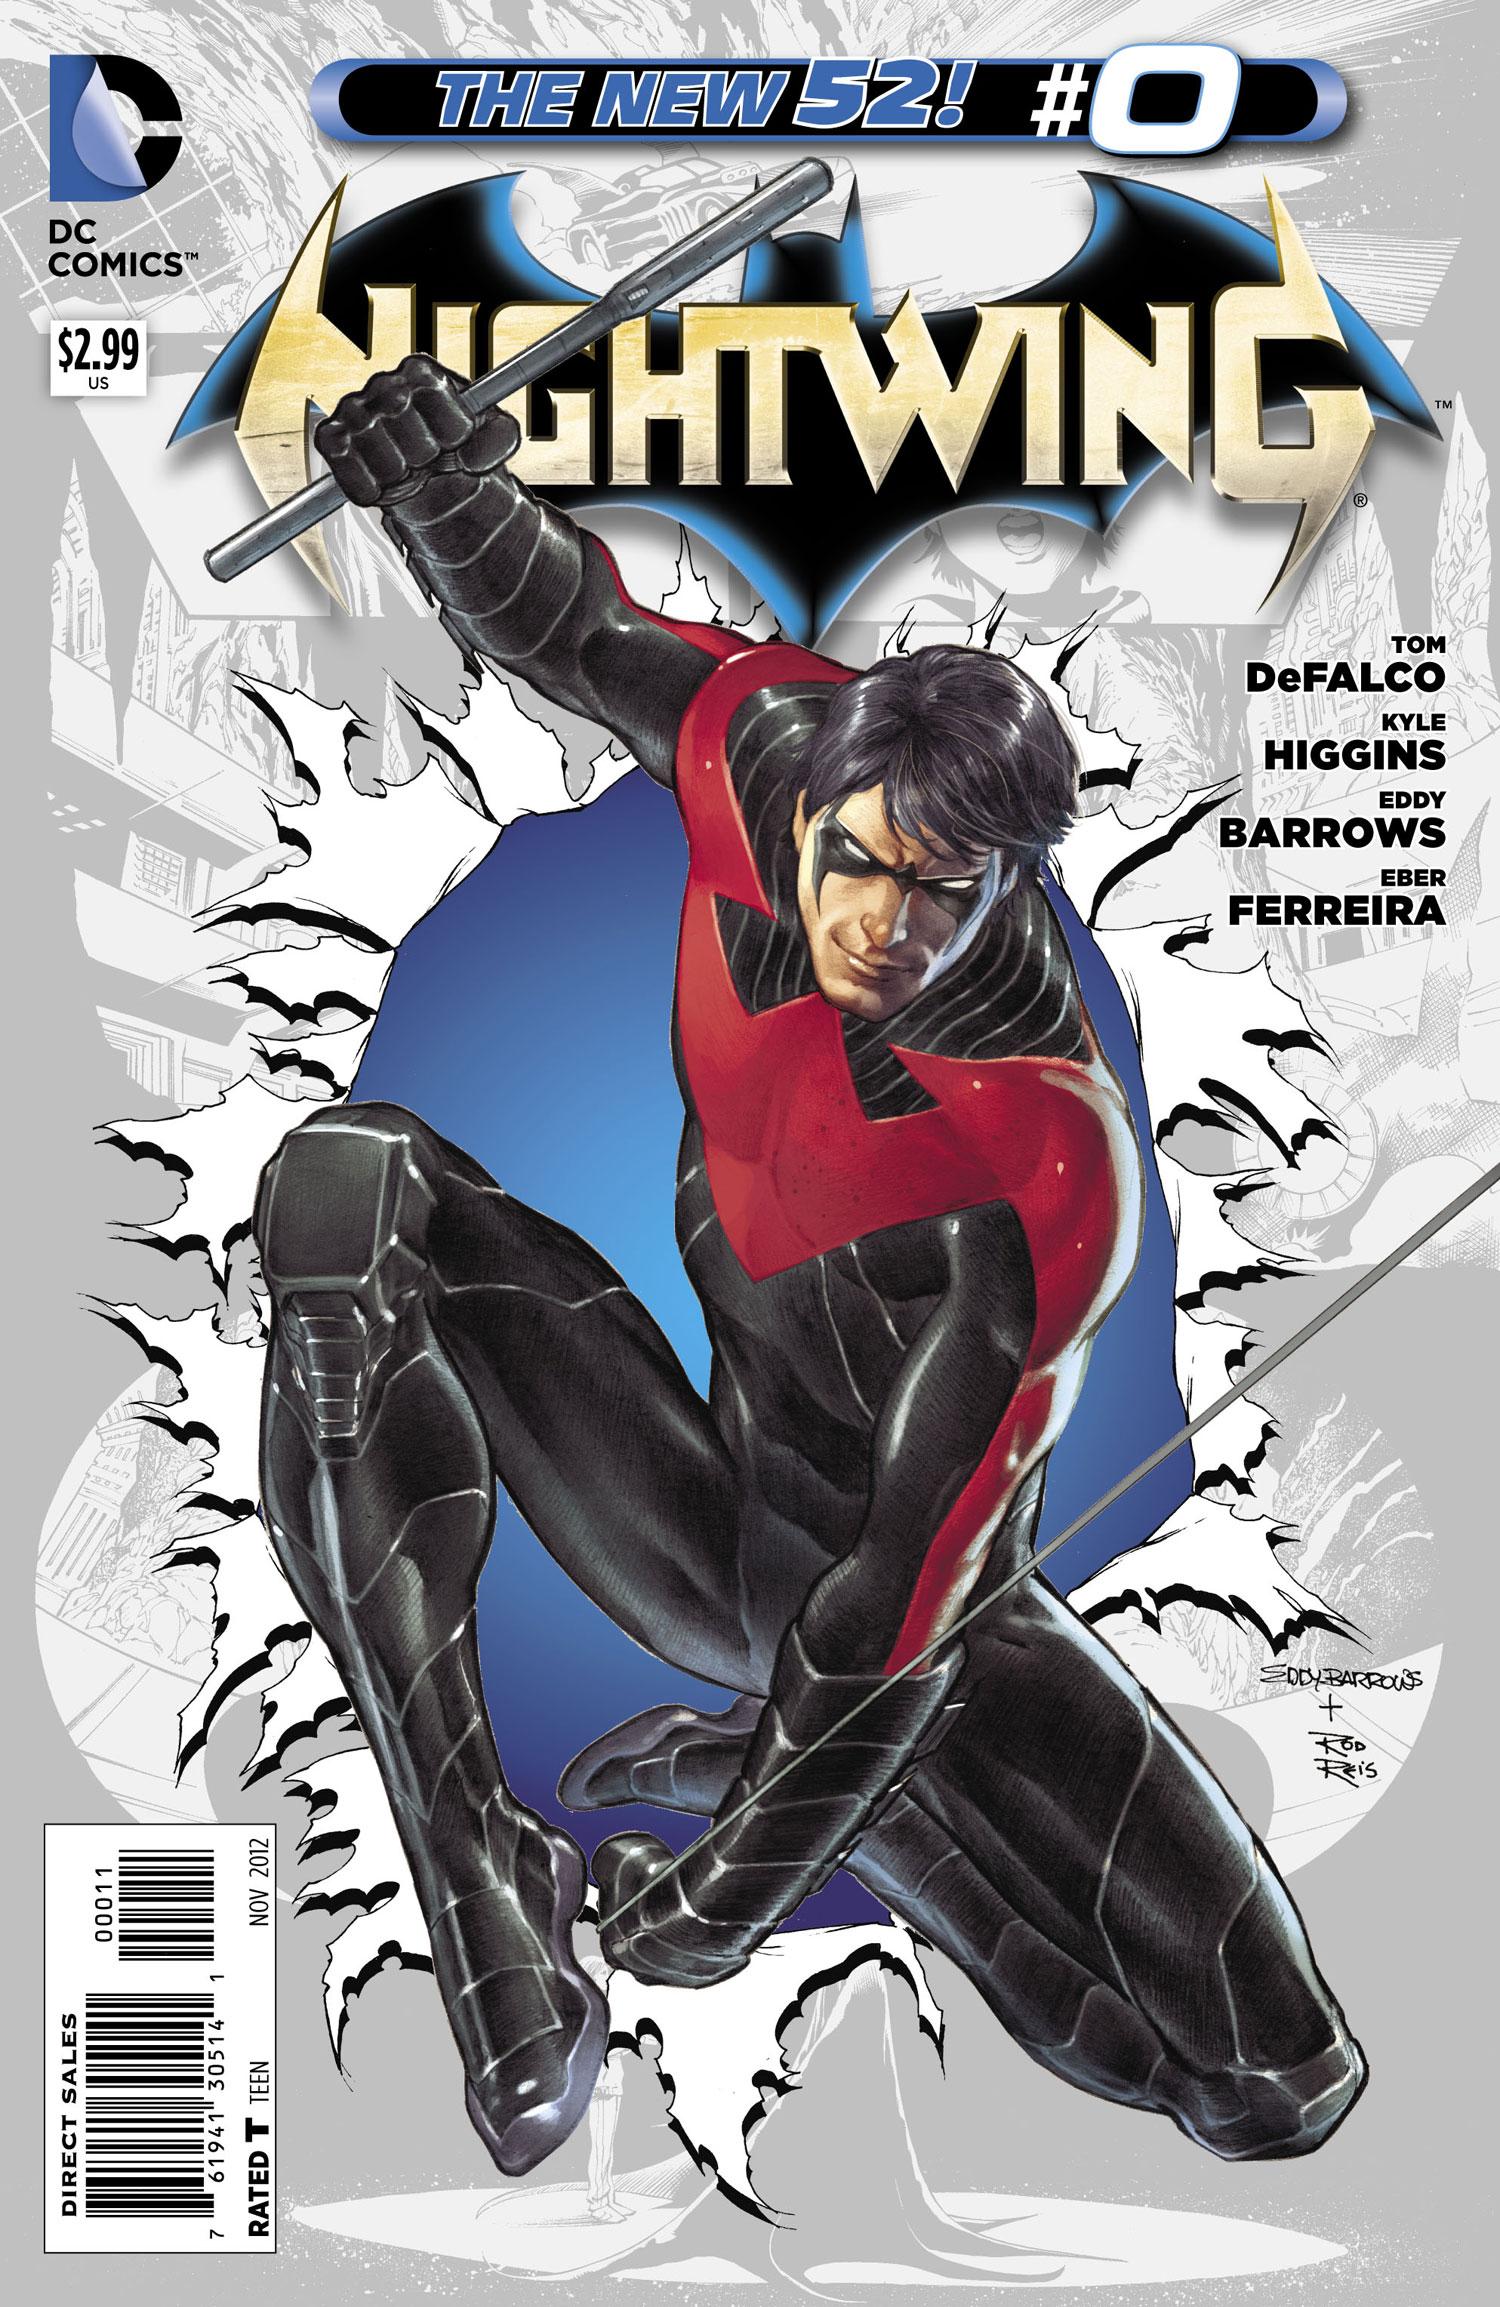 Nightwing 0